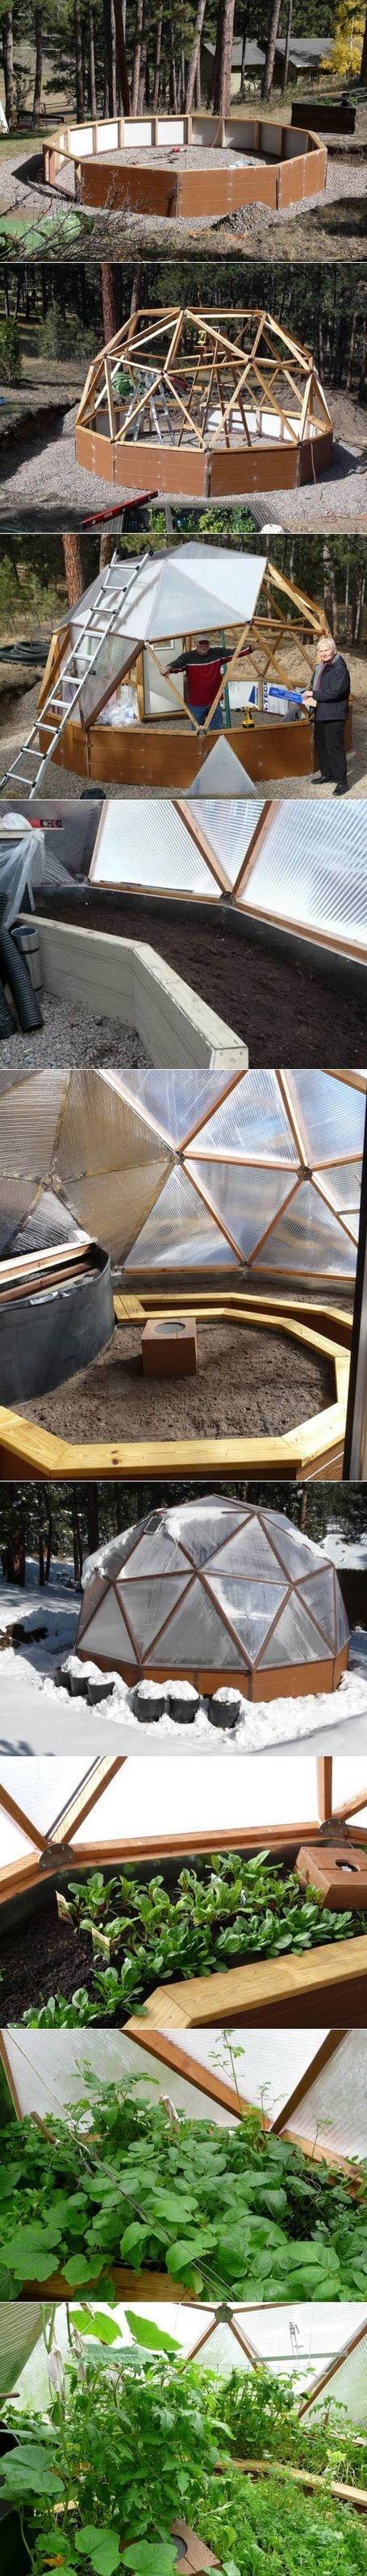 Geodesic Dome Greenhouse https://www.youtube.com/user/AWorld4Change www.AWorld4Change.com #sustainablechange